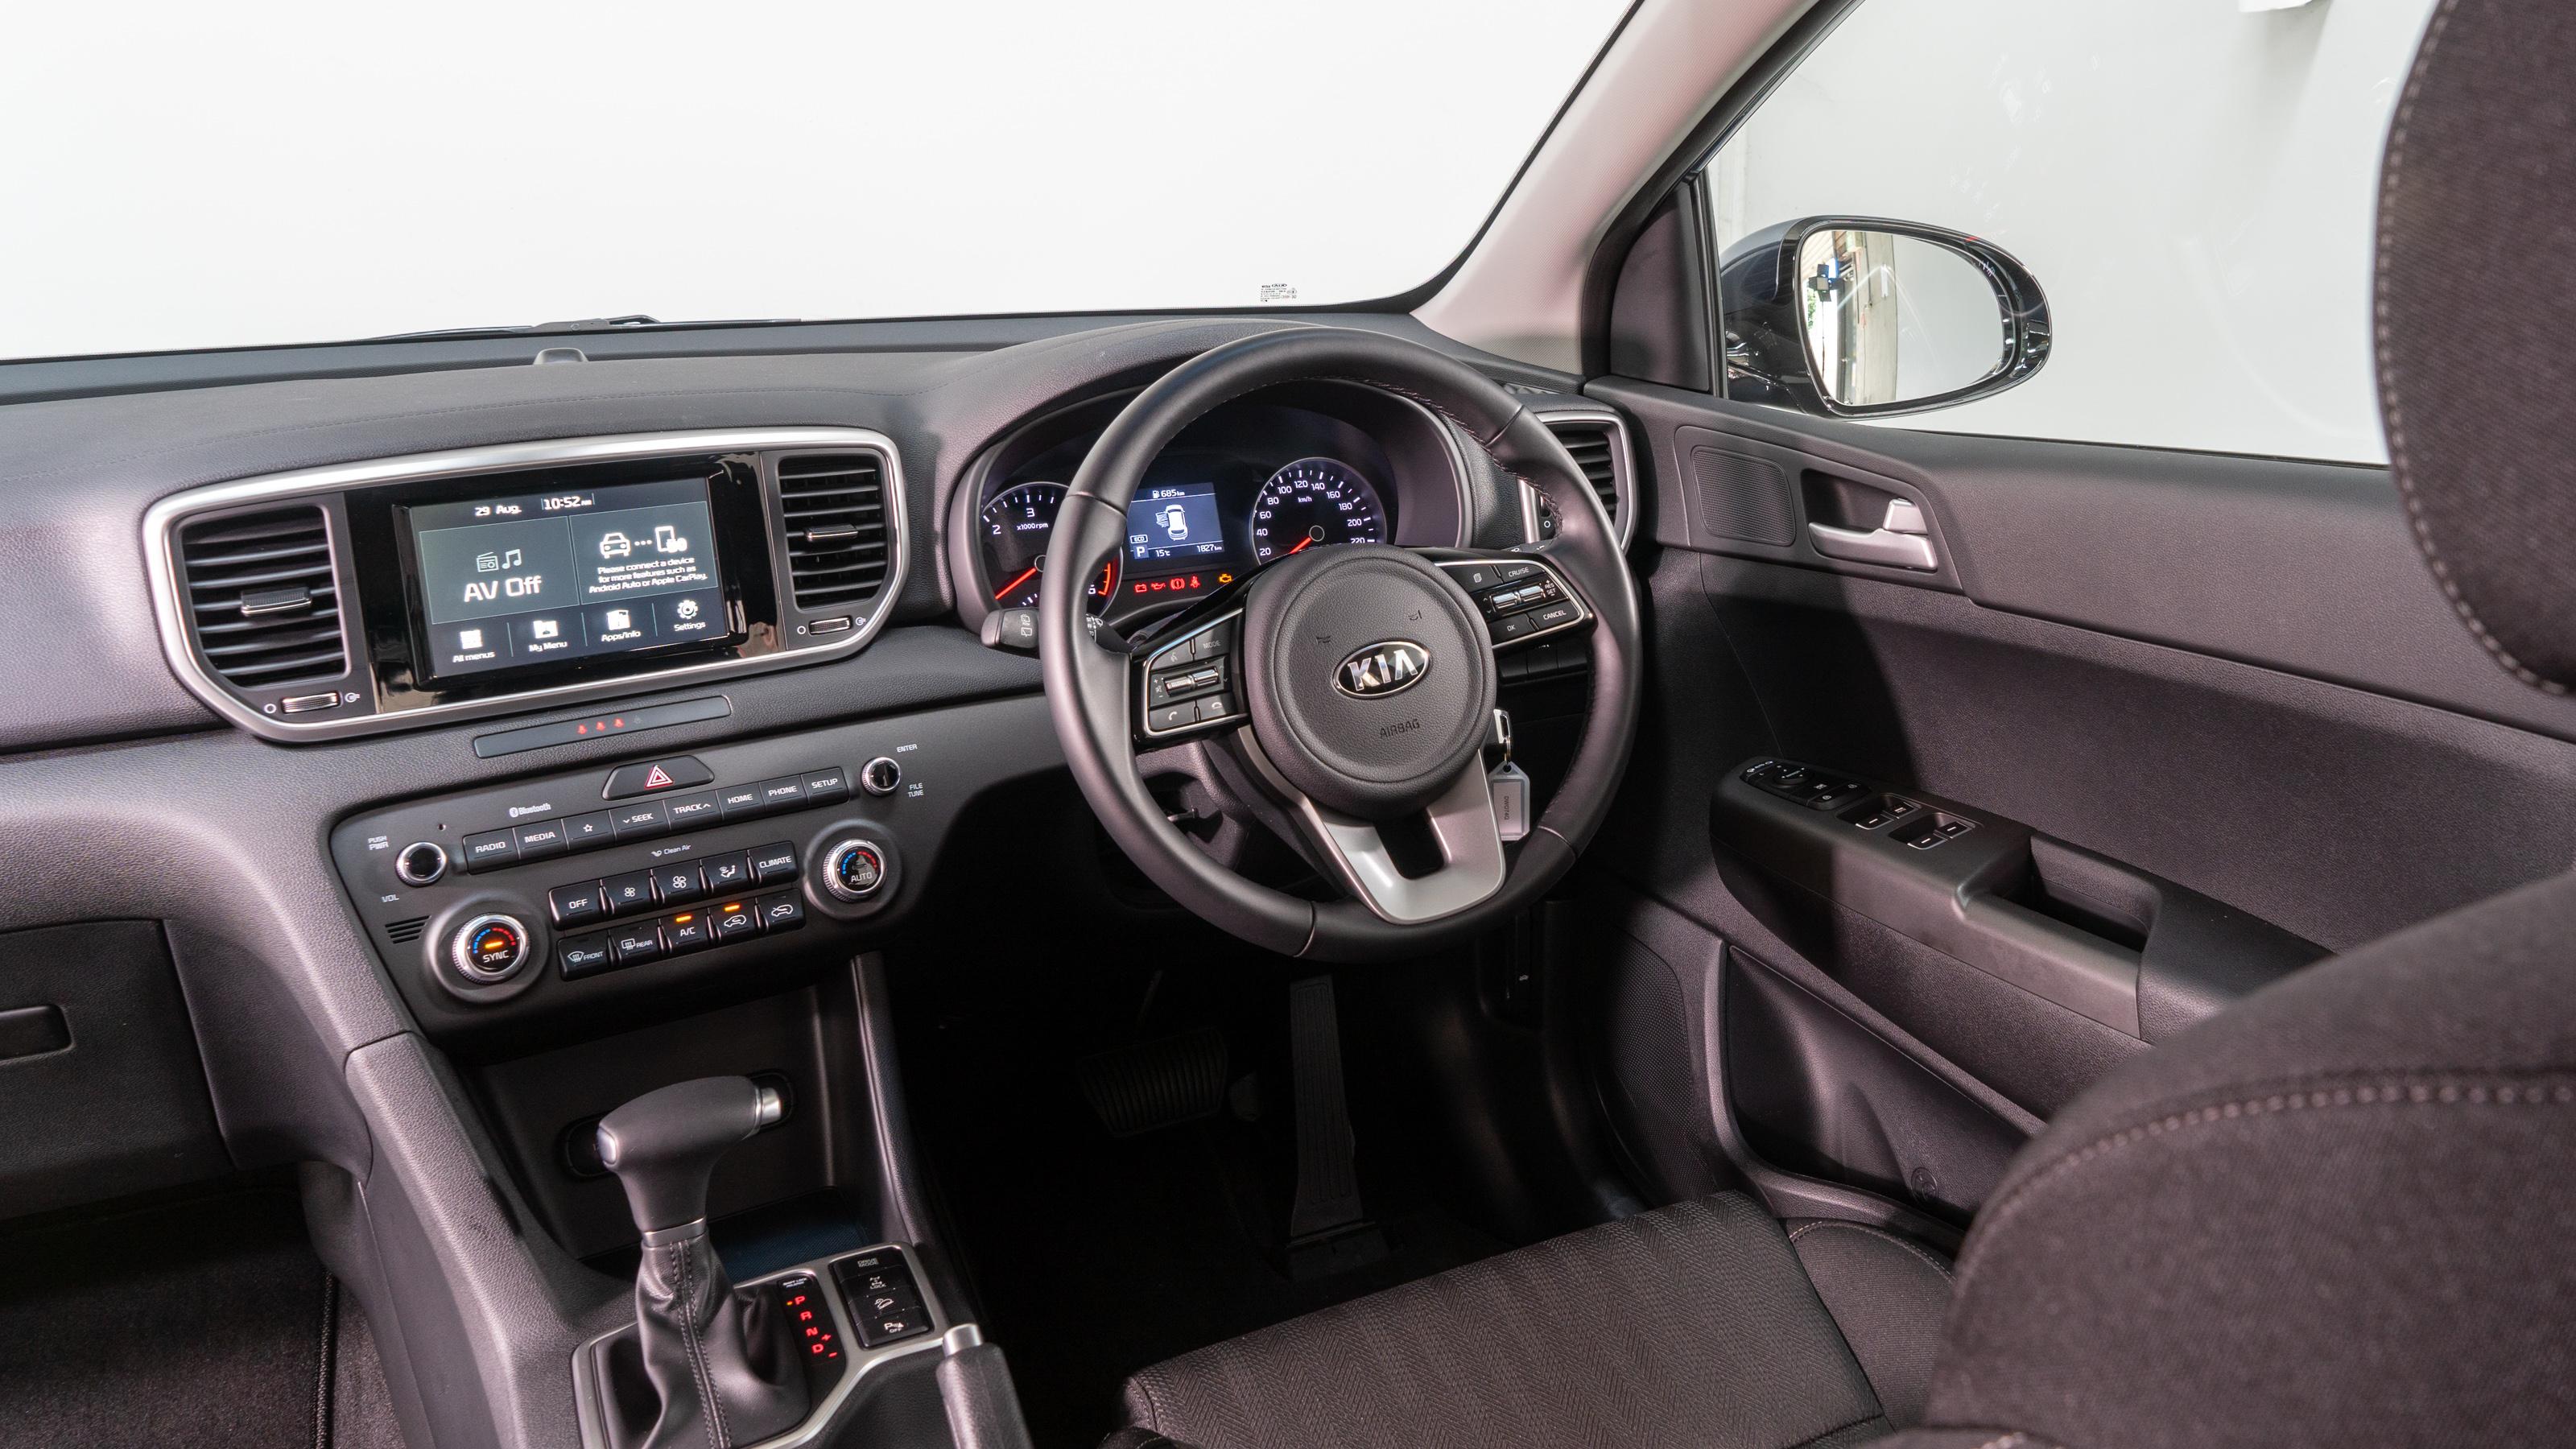 Head to head: Hyundai Tucson and Kia Sportage